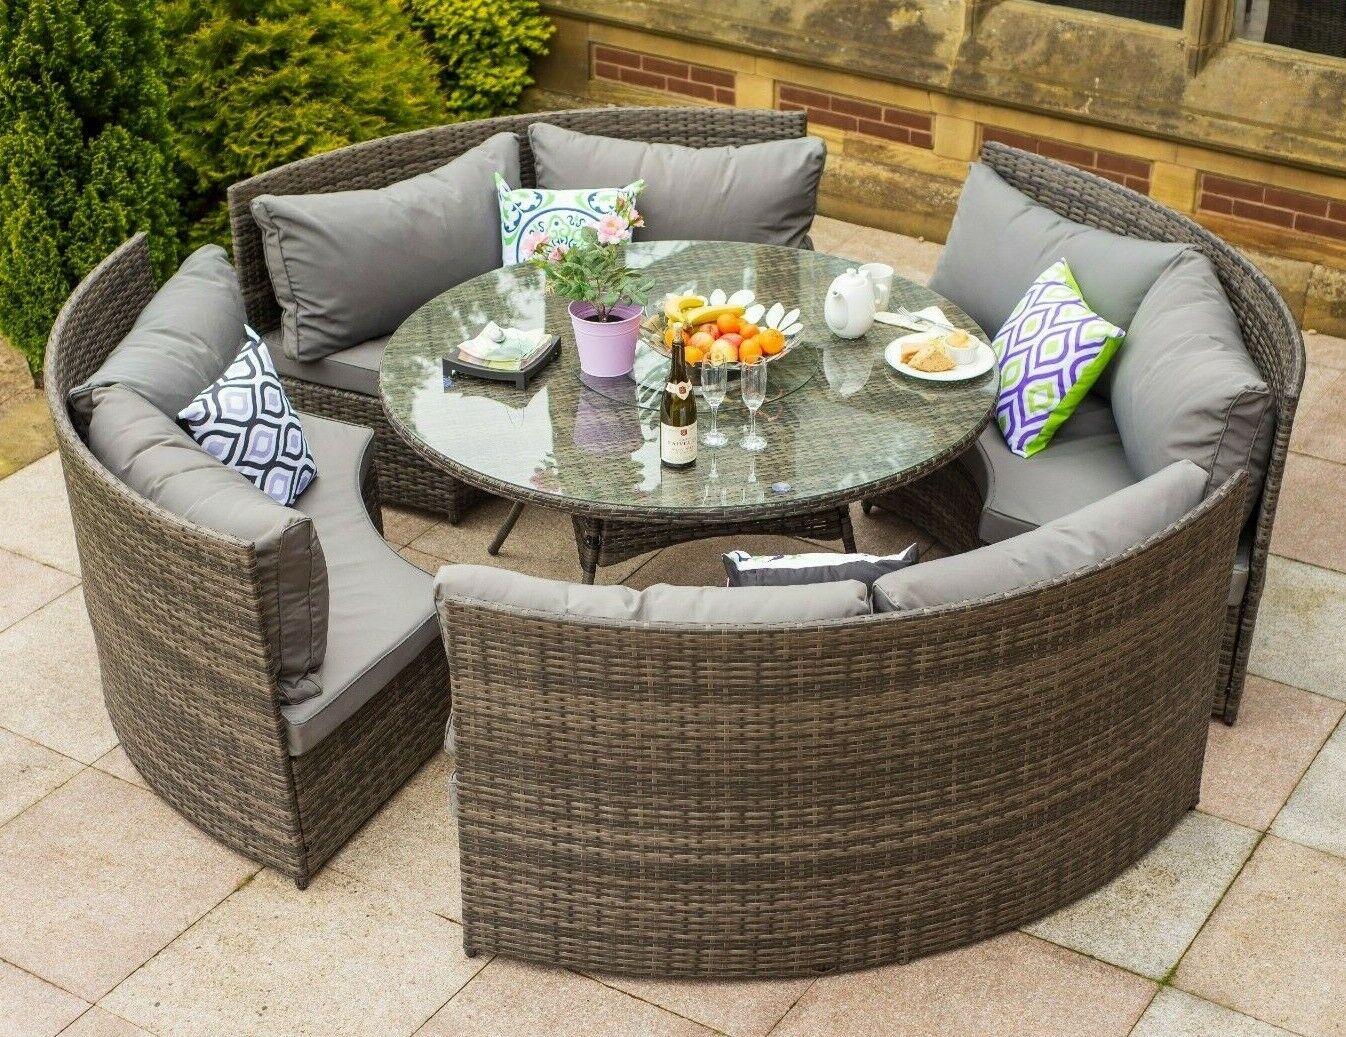 Yakoe Monaco round 6 Seater Patio dining set rattan garden furniture set